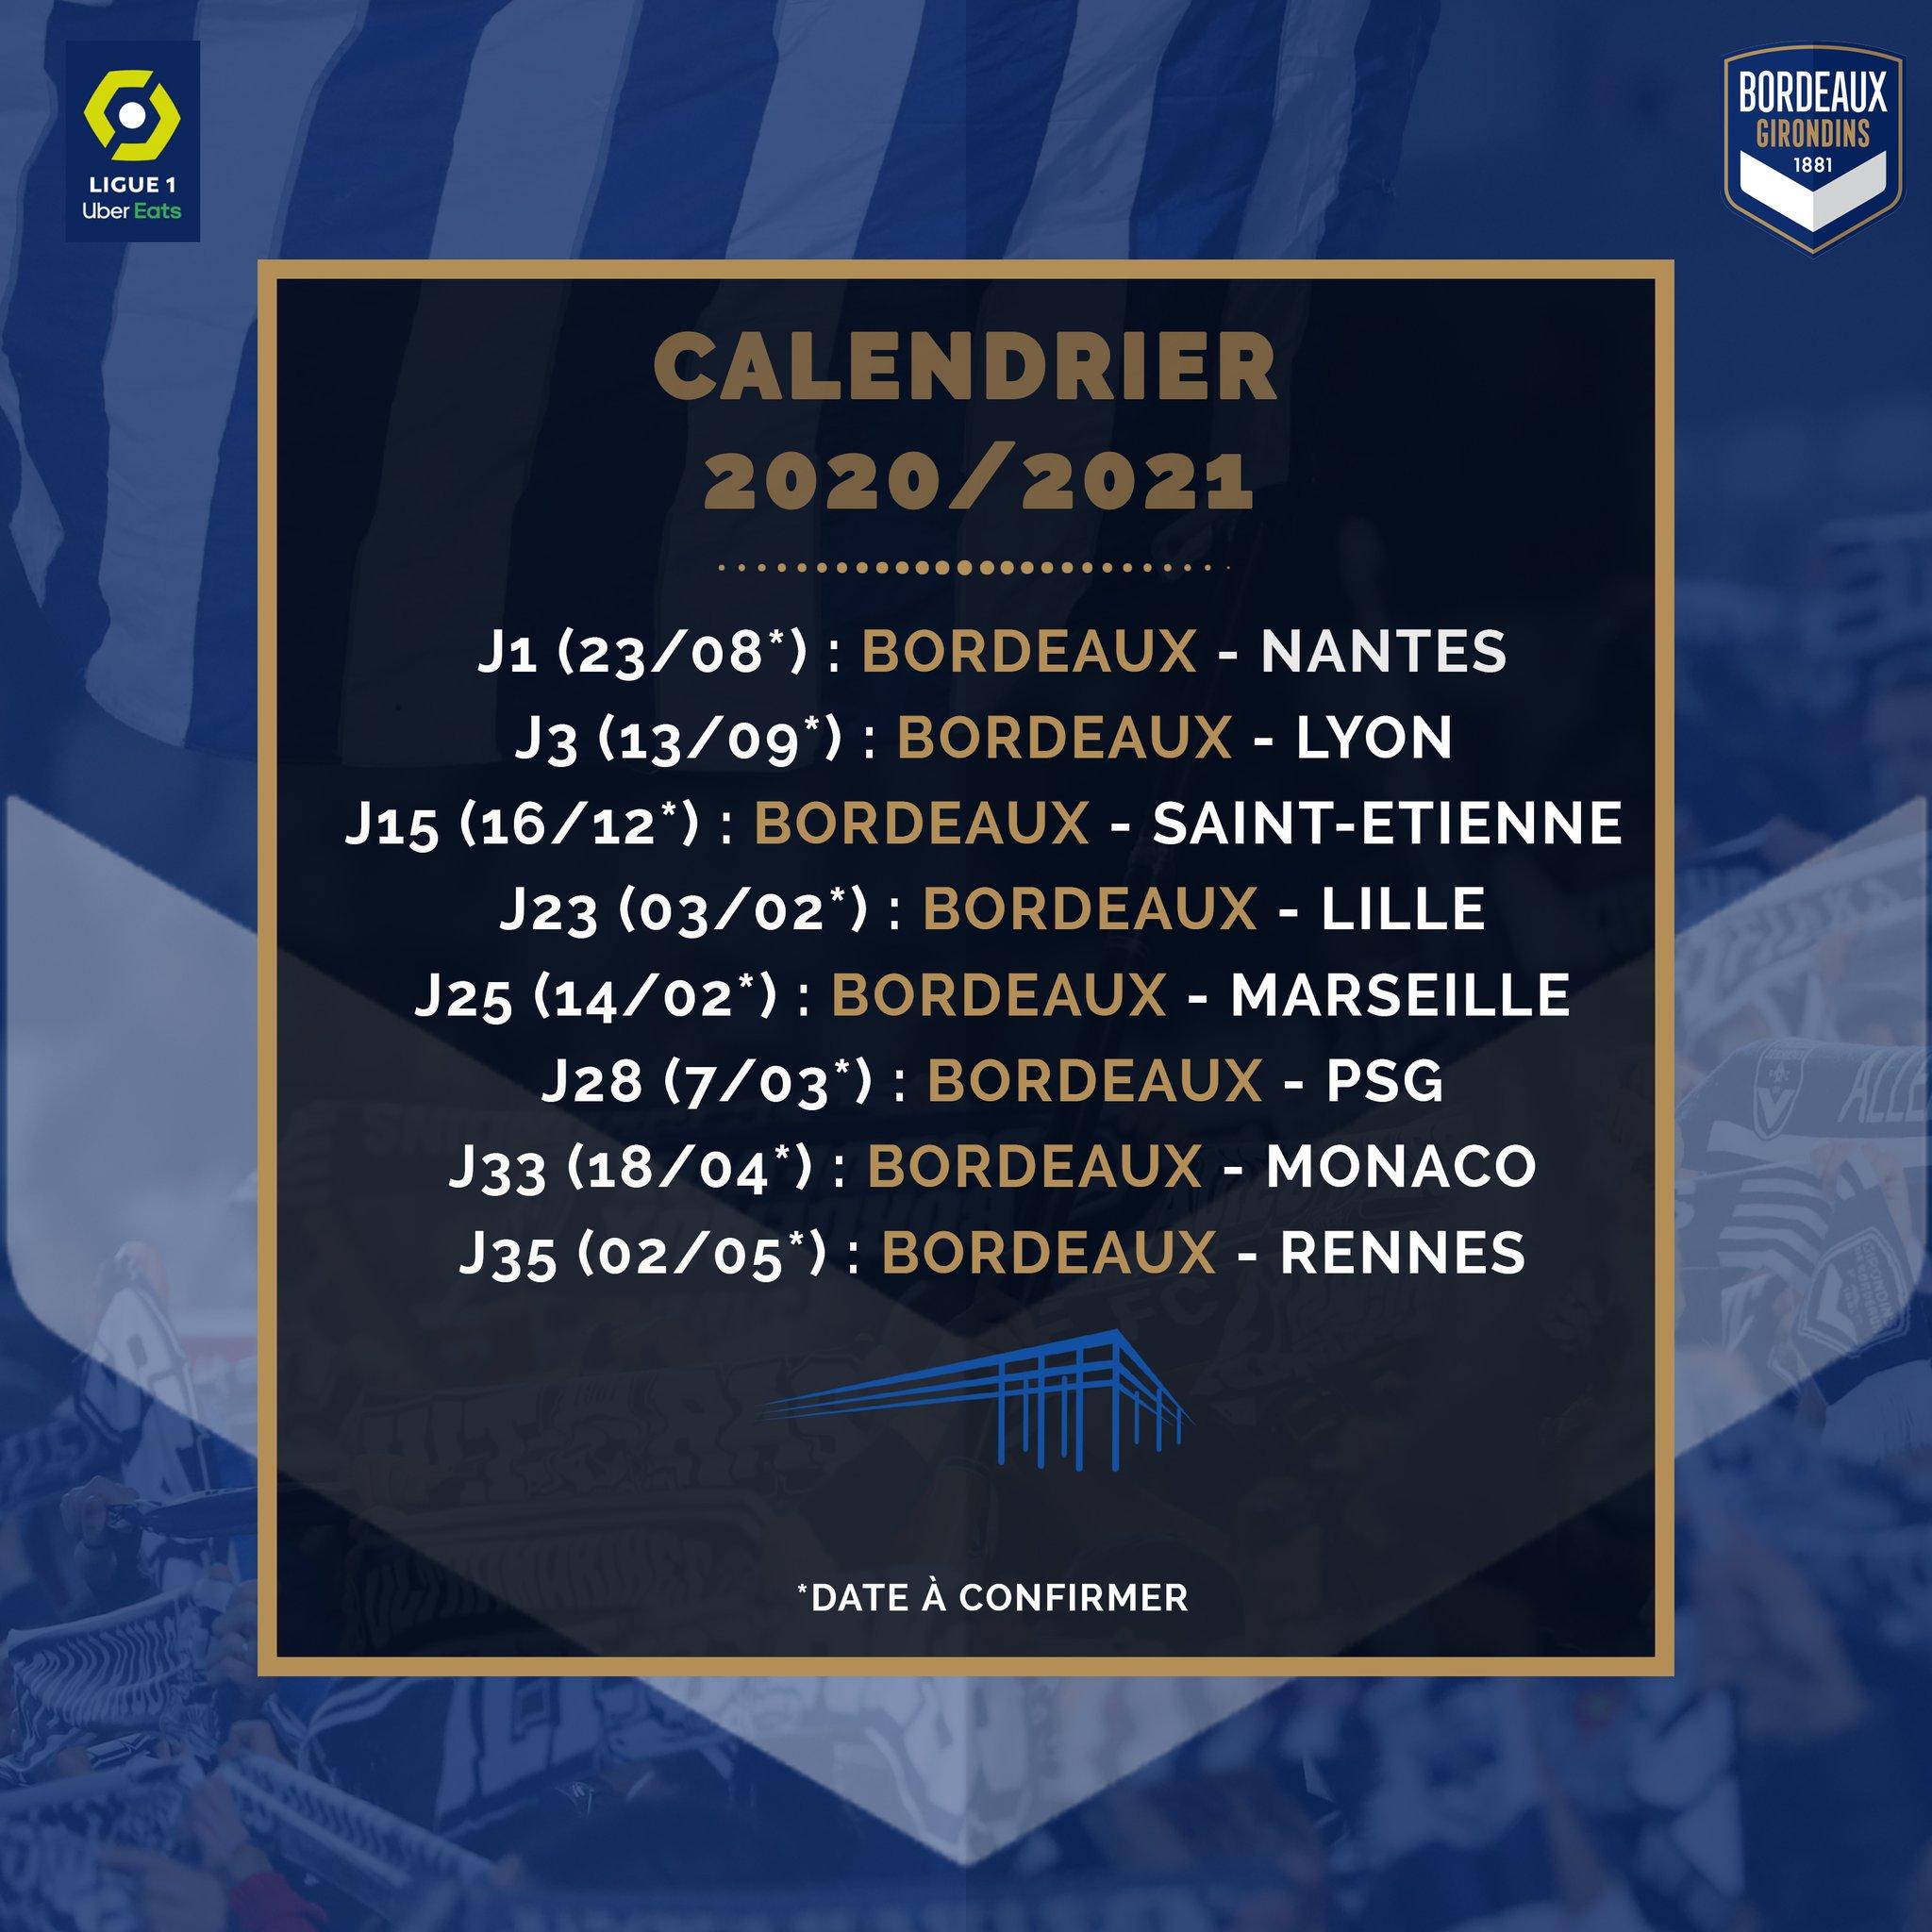 Girondins4Ever   Le calendrier complet des Girondins, pour la